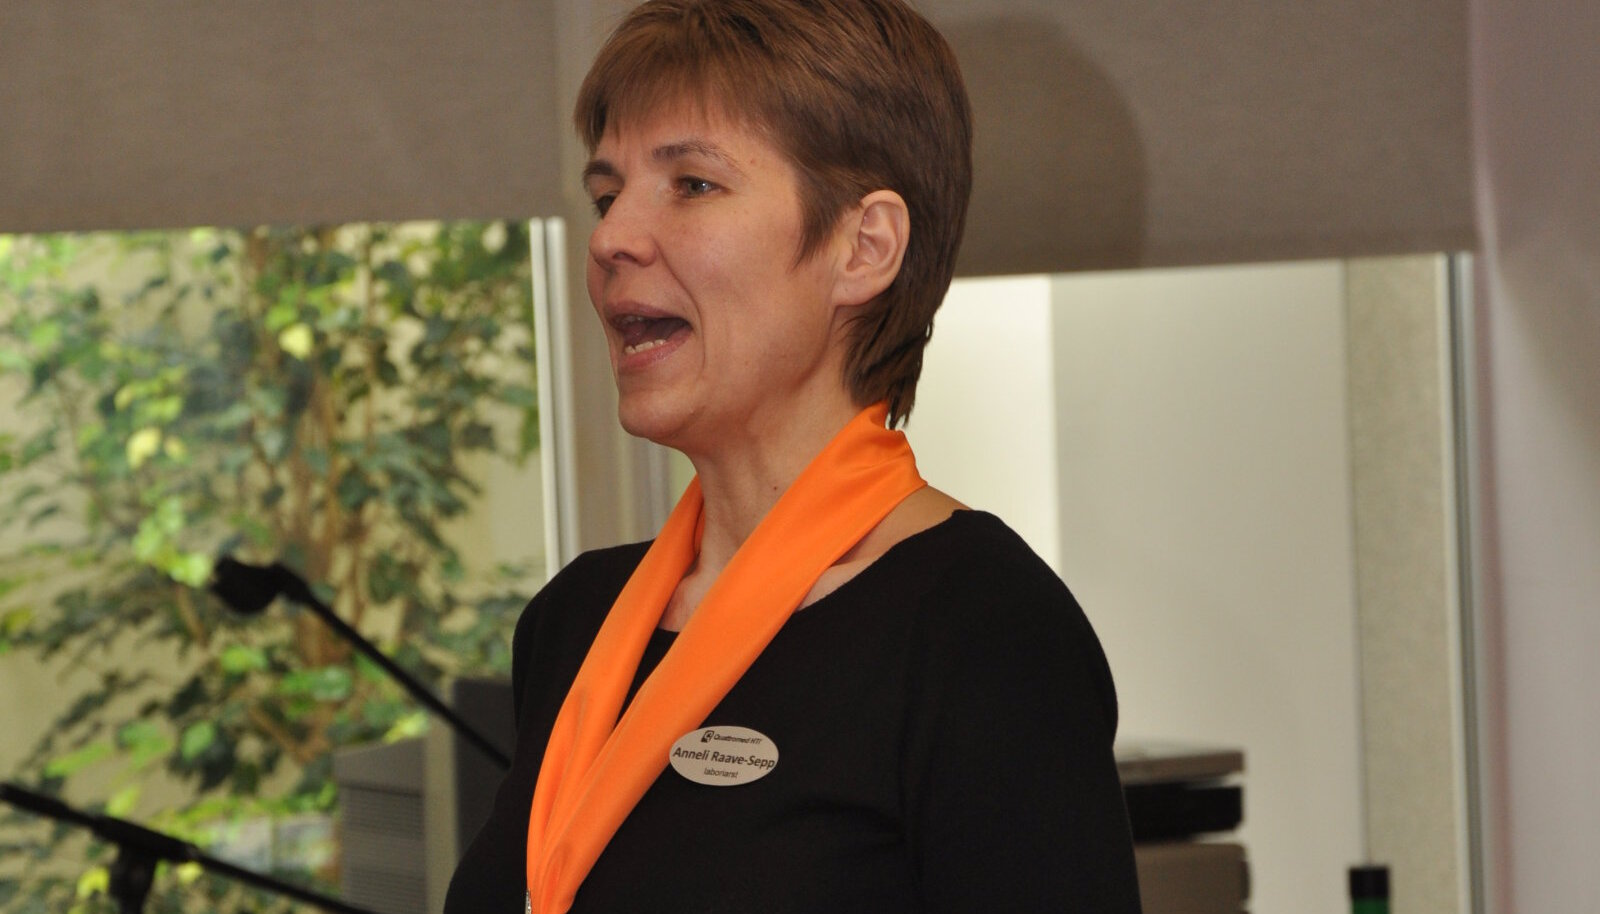 Dr Anneli Raave-Sepp pidamas perearstidele loengut